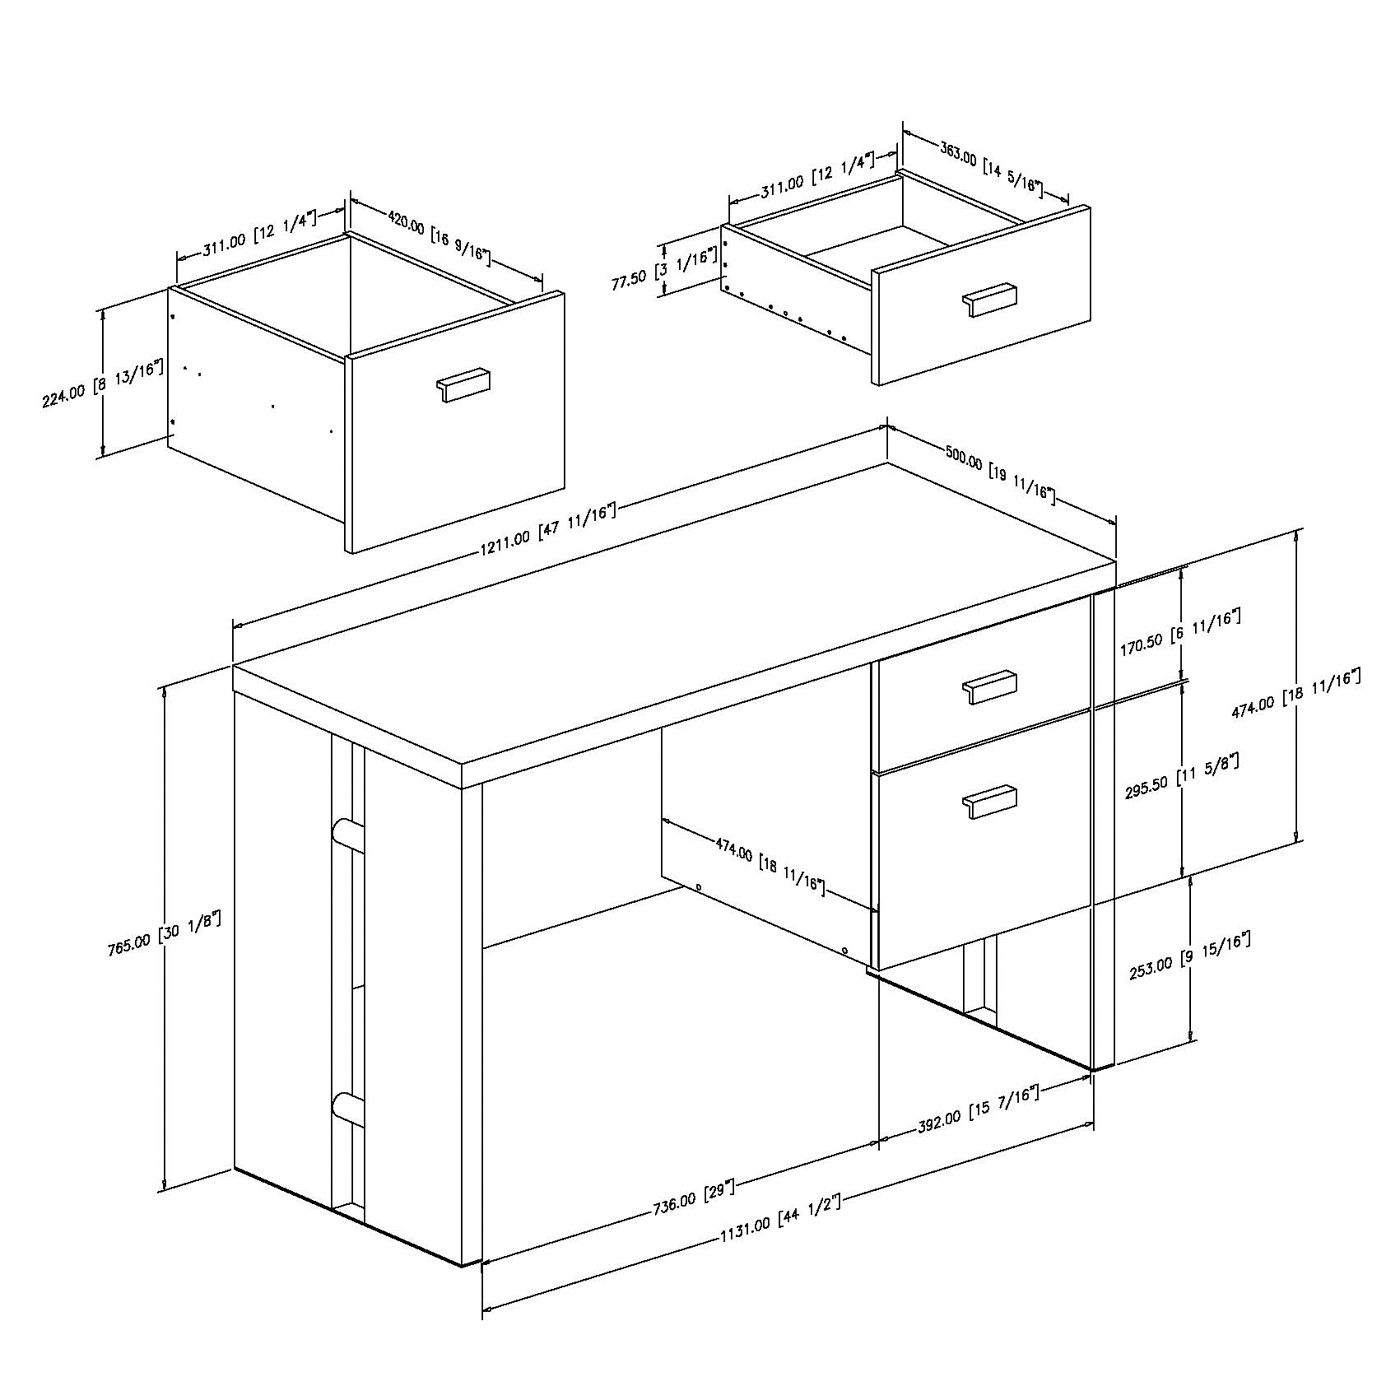 ergonomic chair design dimensions papasan frame and base office desk home furniture set check